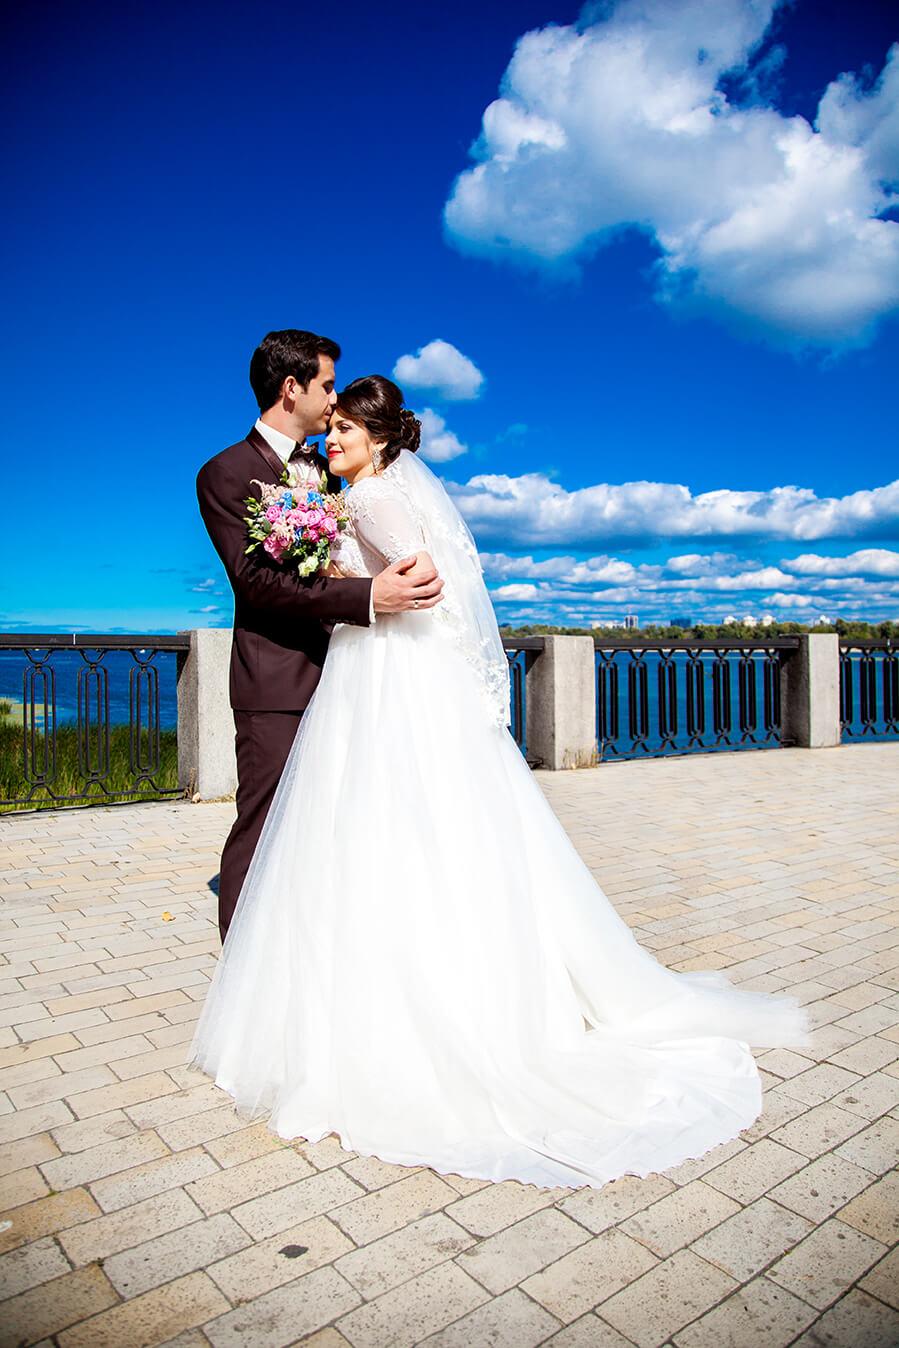 1-svadebnoe-foto-kiev-svadebnaja-progulka-mesta-dlja-svadebnoj-fotosessii-11